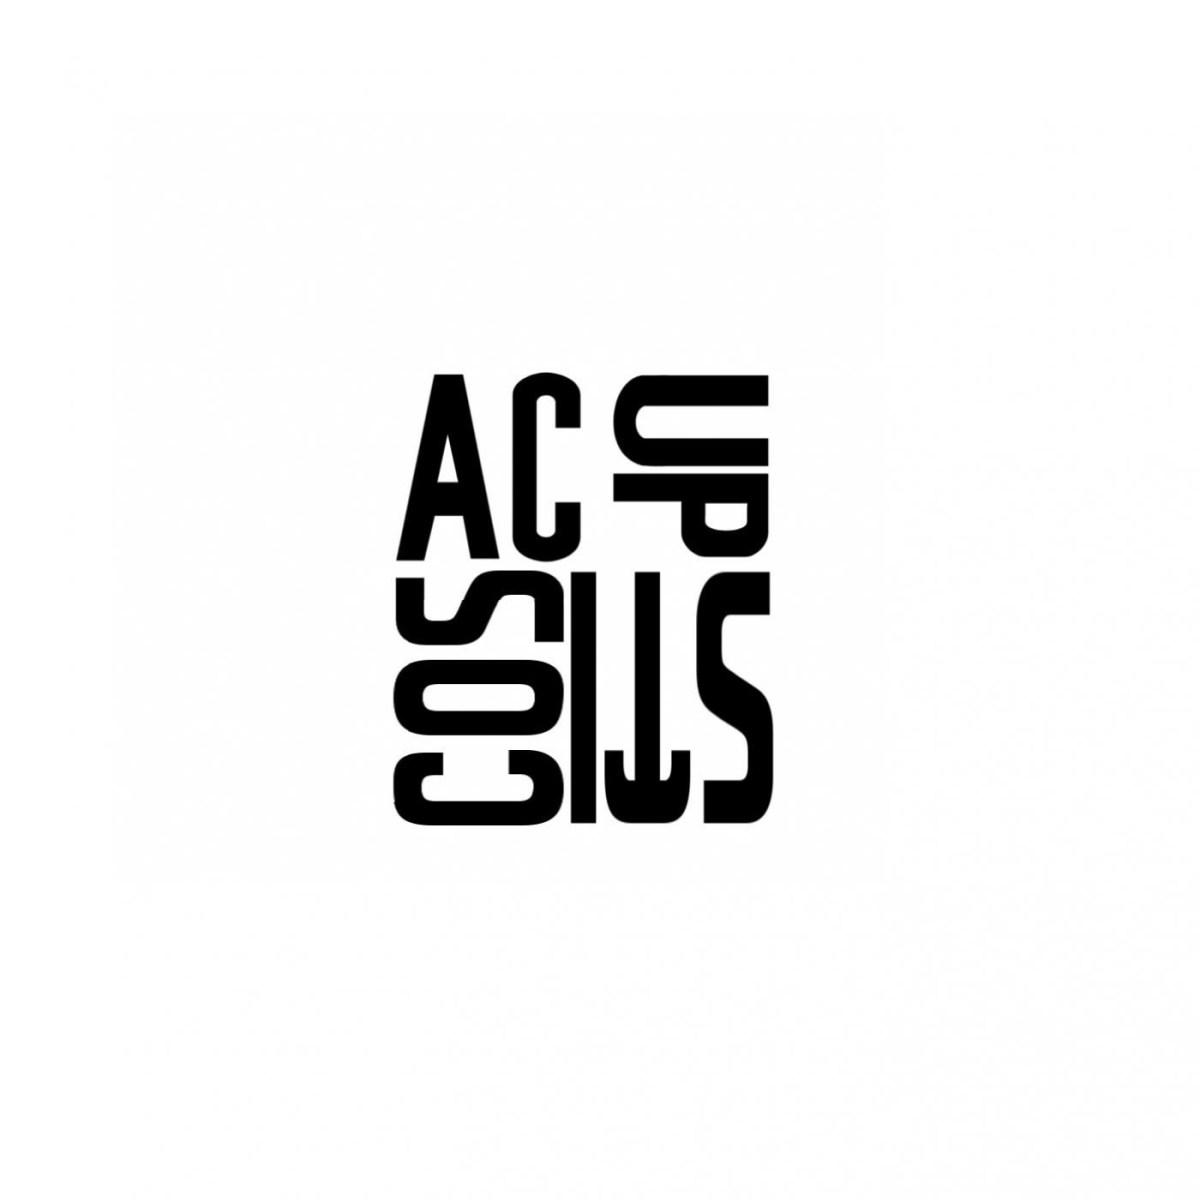 ACUPsticos